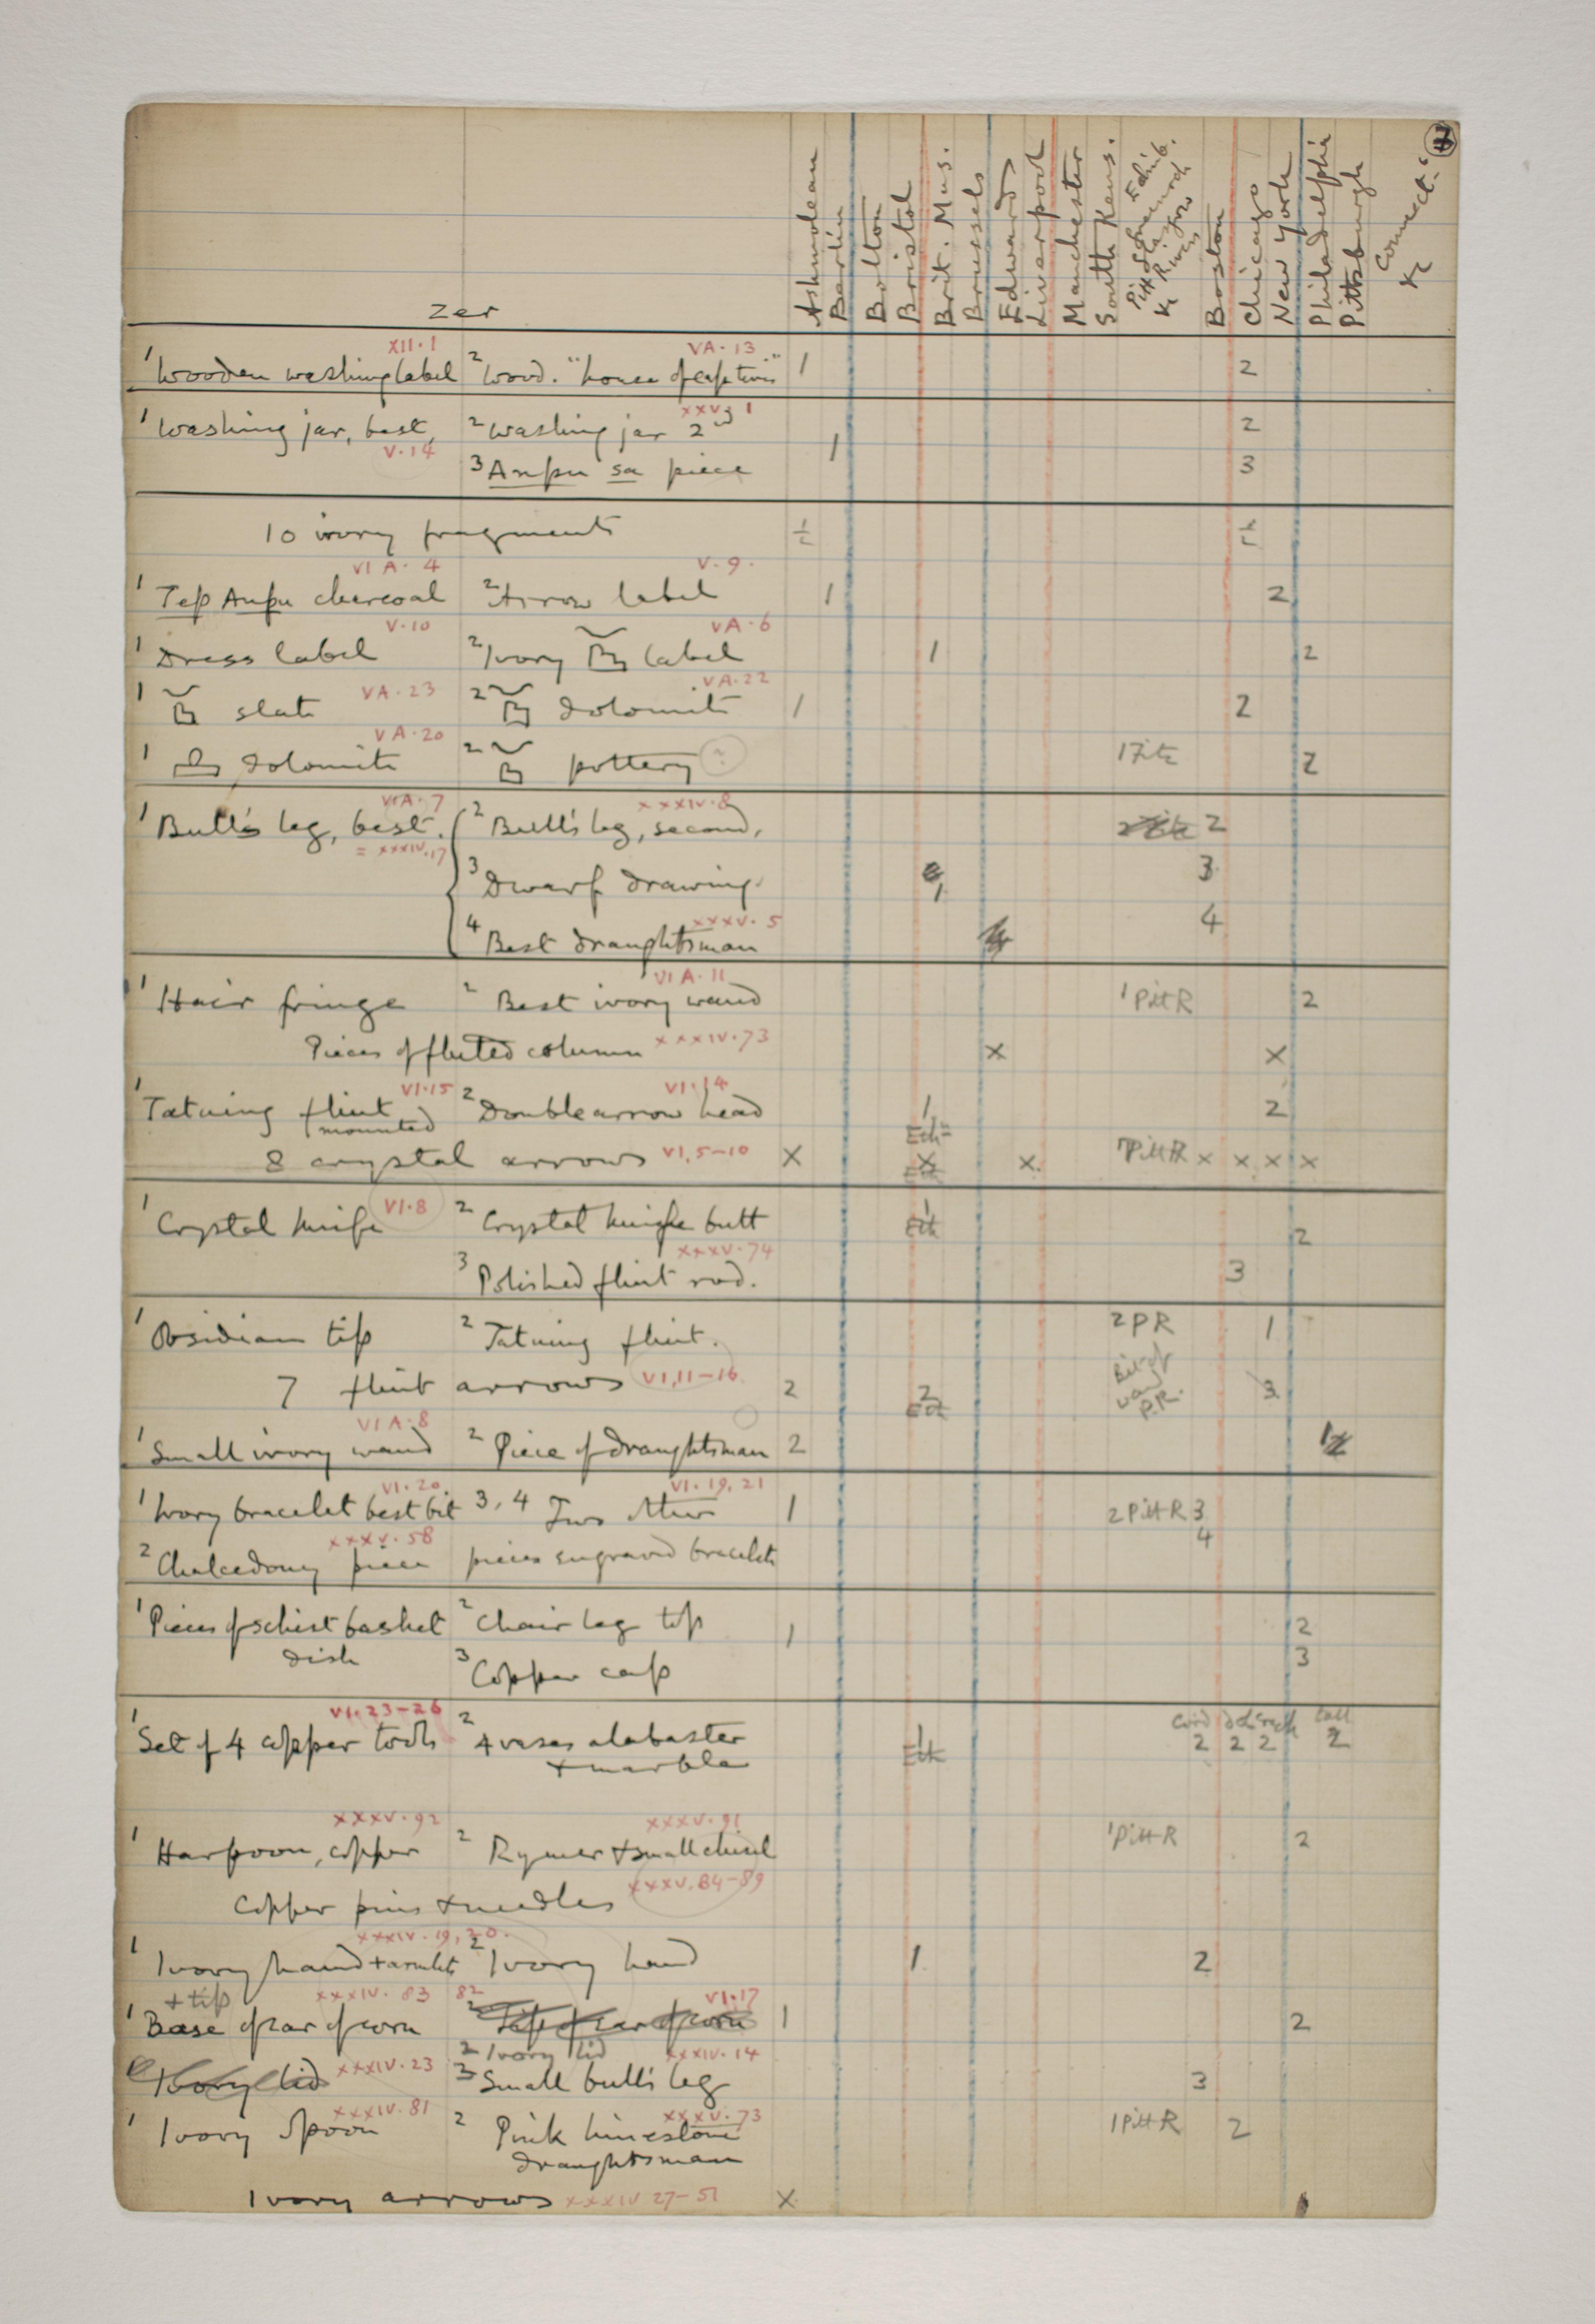 Abydos, Bet Khallaf, el-Mahasna 1900-1901, Distribution Grid, PMA/WFP1/D/9/7